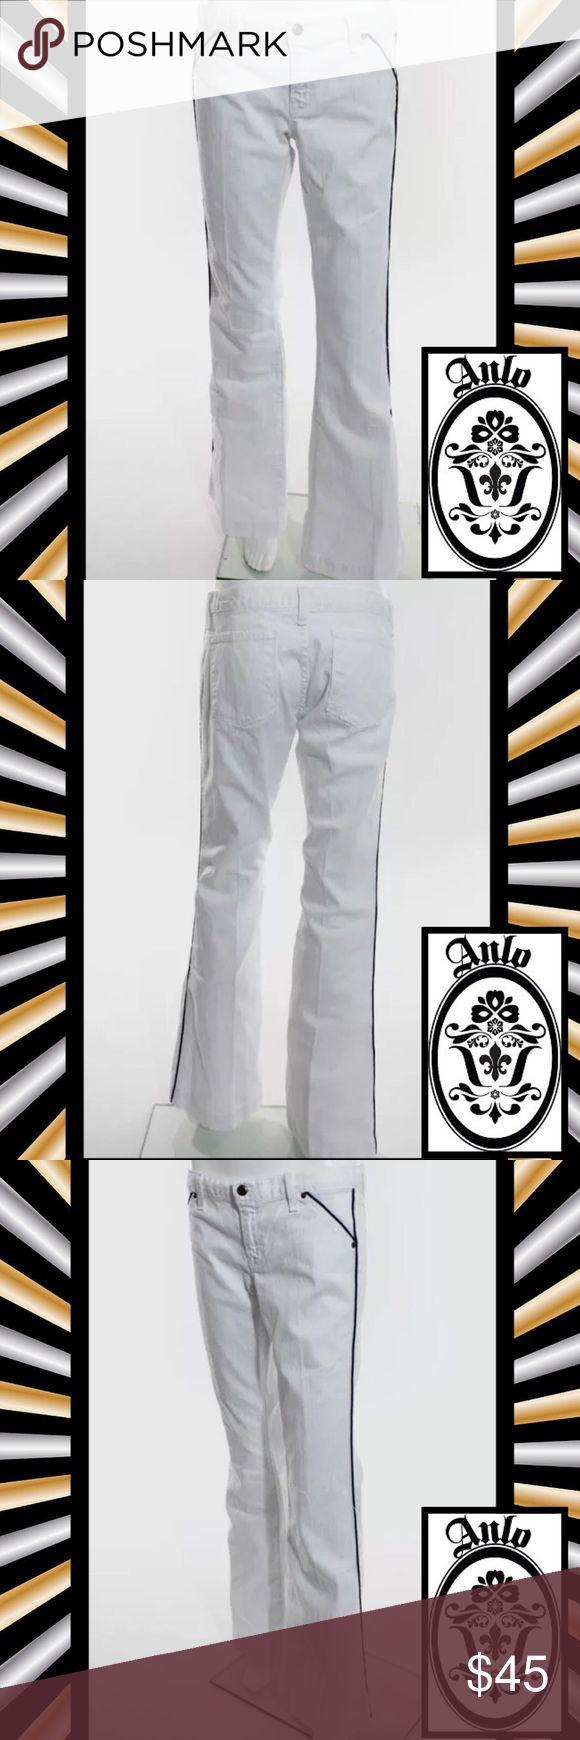 "ANLO Perfect White/Black Stripe Flare Leg Jeans SIZE 29. 41"" Length. 29"" Waist. 33"" Inseam. 97% Cotton/3% Lycra Blend. White Flare Leg Jeans w Black Piping Stripe On Sides. EUC WORN ONCE Anlo Jeans Flare & Wide Leg"